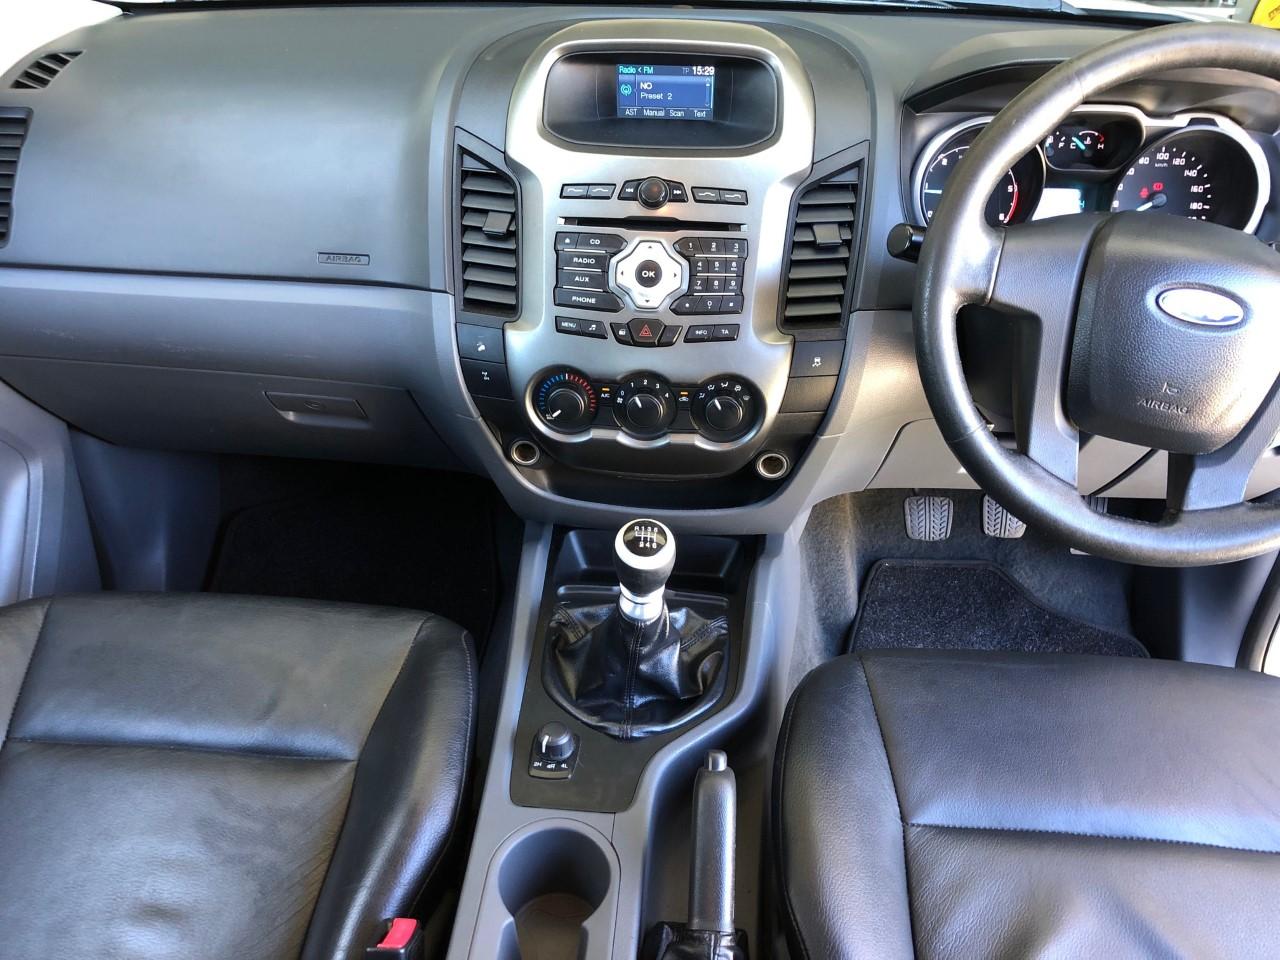 2012 Ford Ranger SuperCab RANGER 3.2TDCi XLS 4X4 P/U SUP/CAB